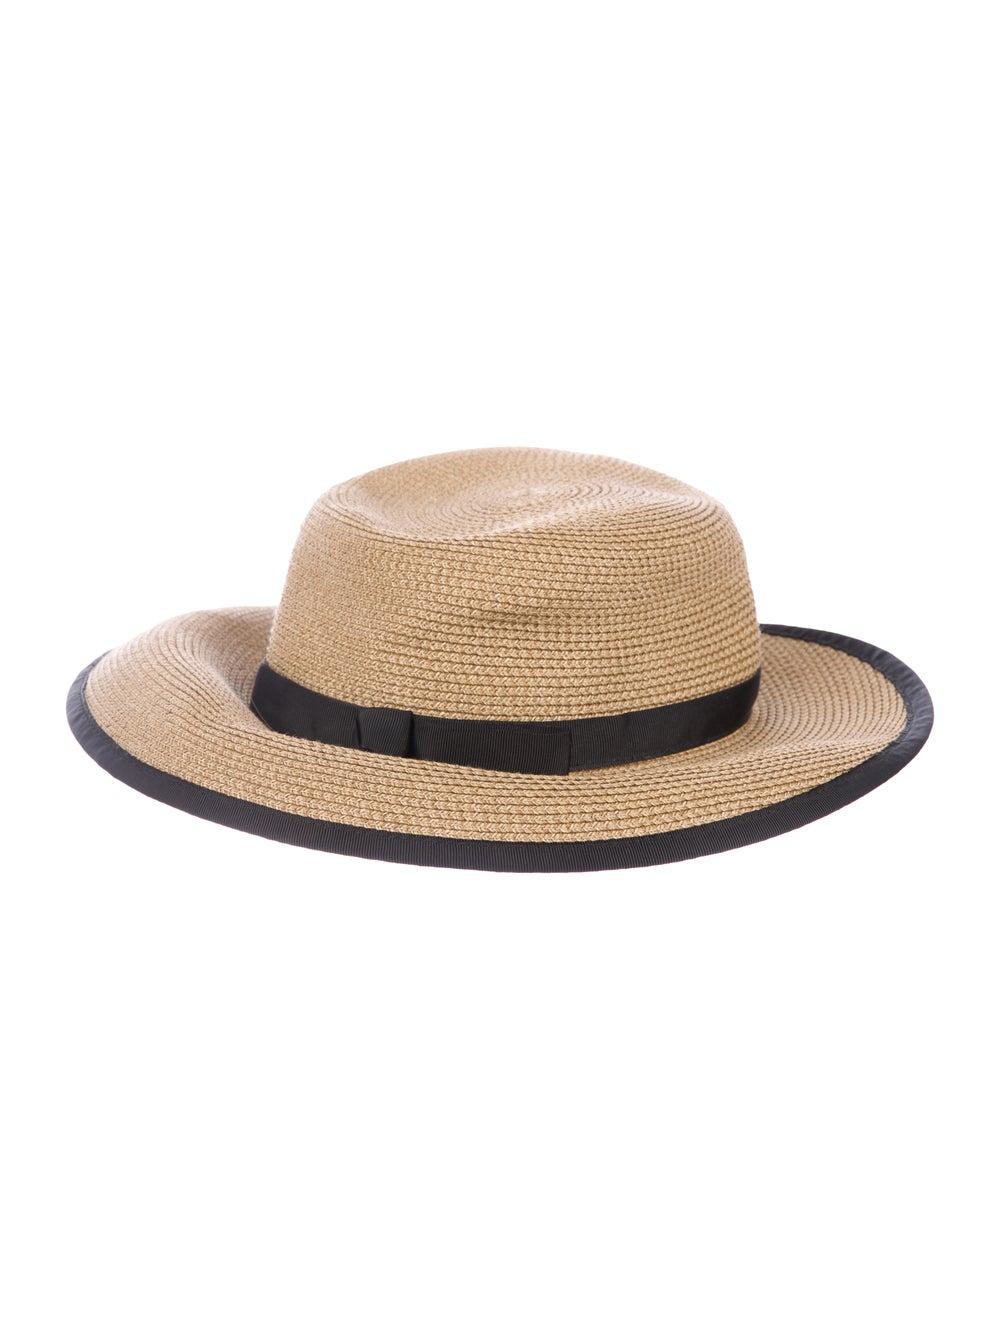 Eric Javits Straw Velcro Hat brown - image 1